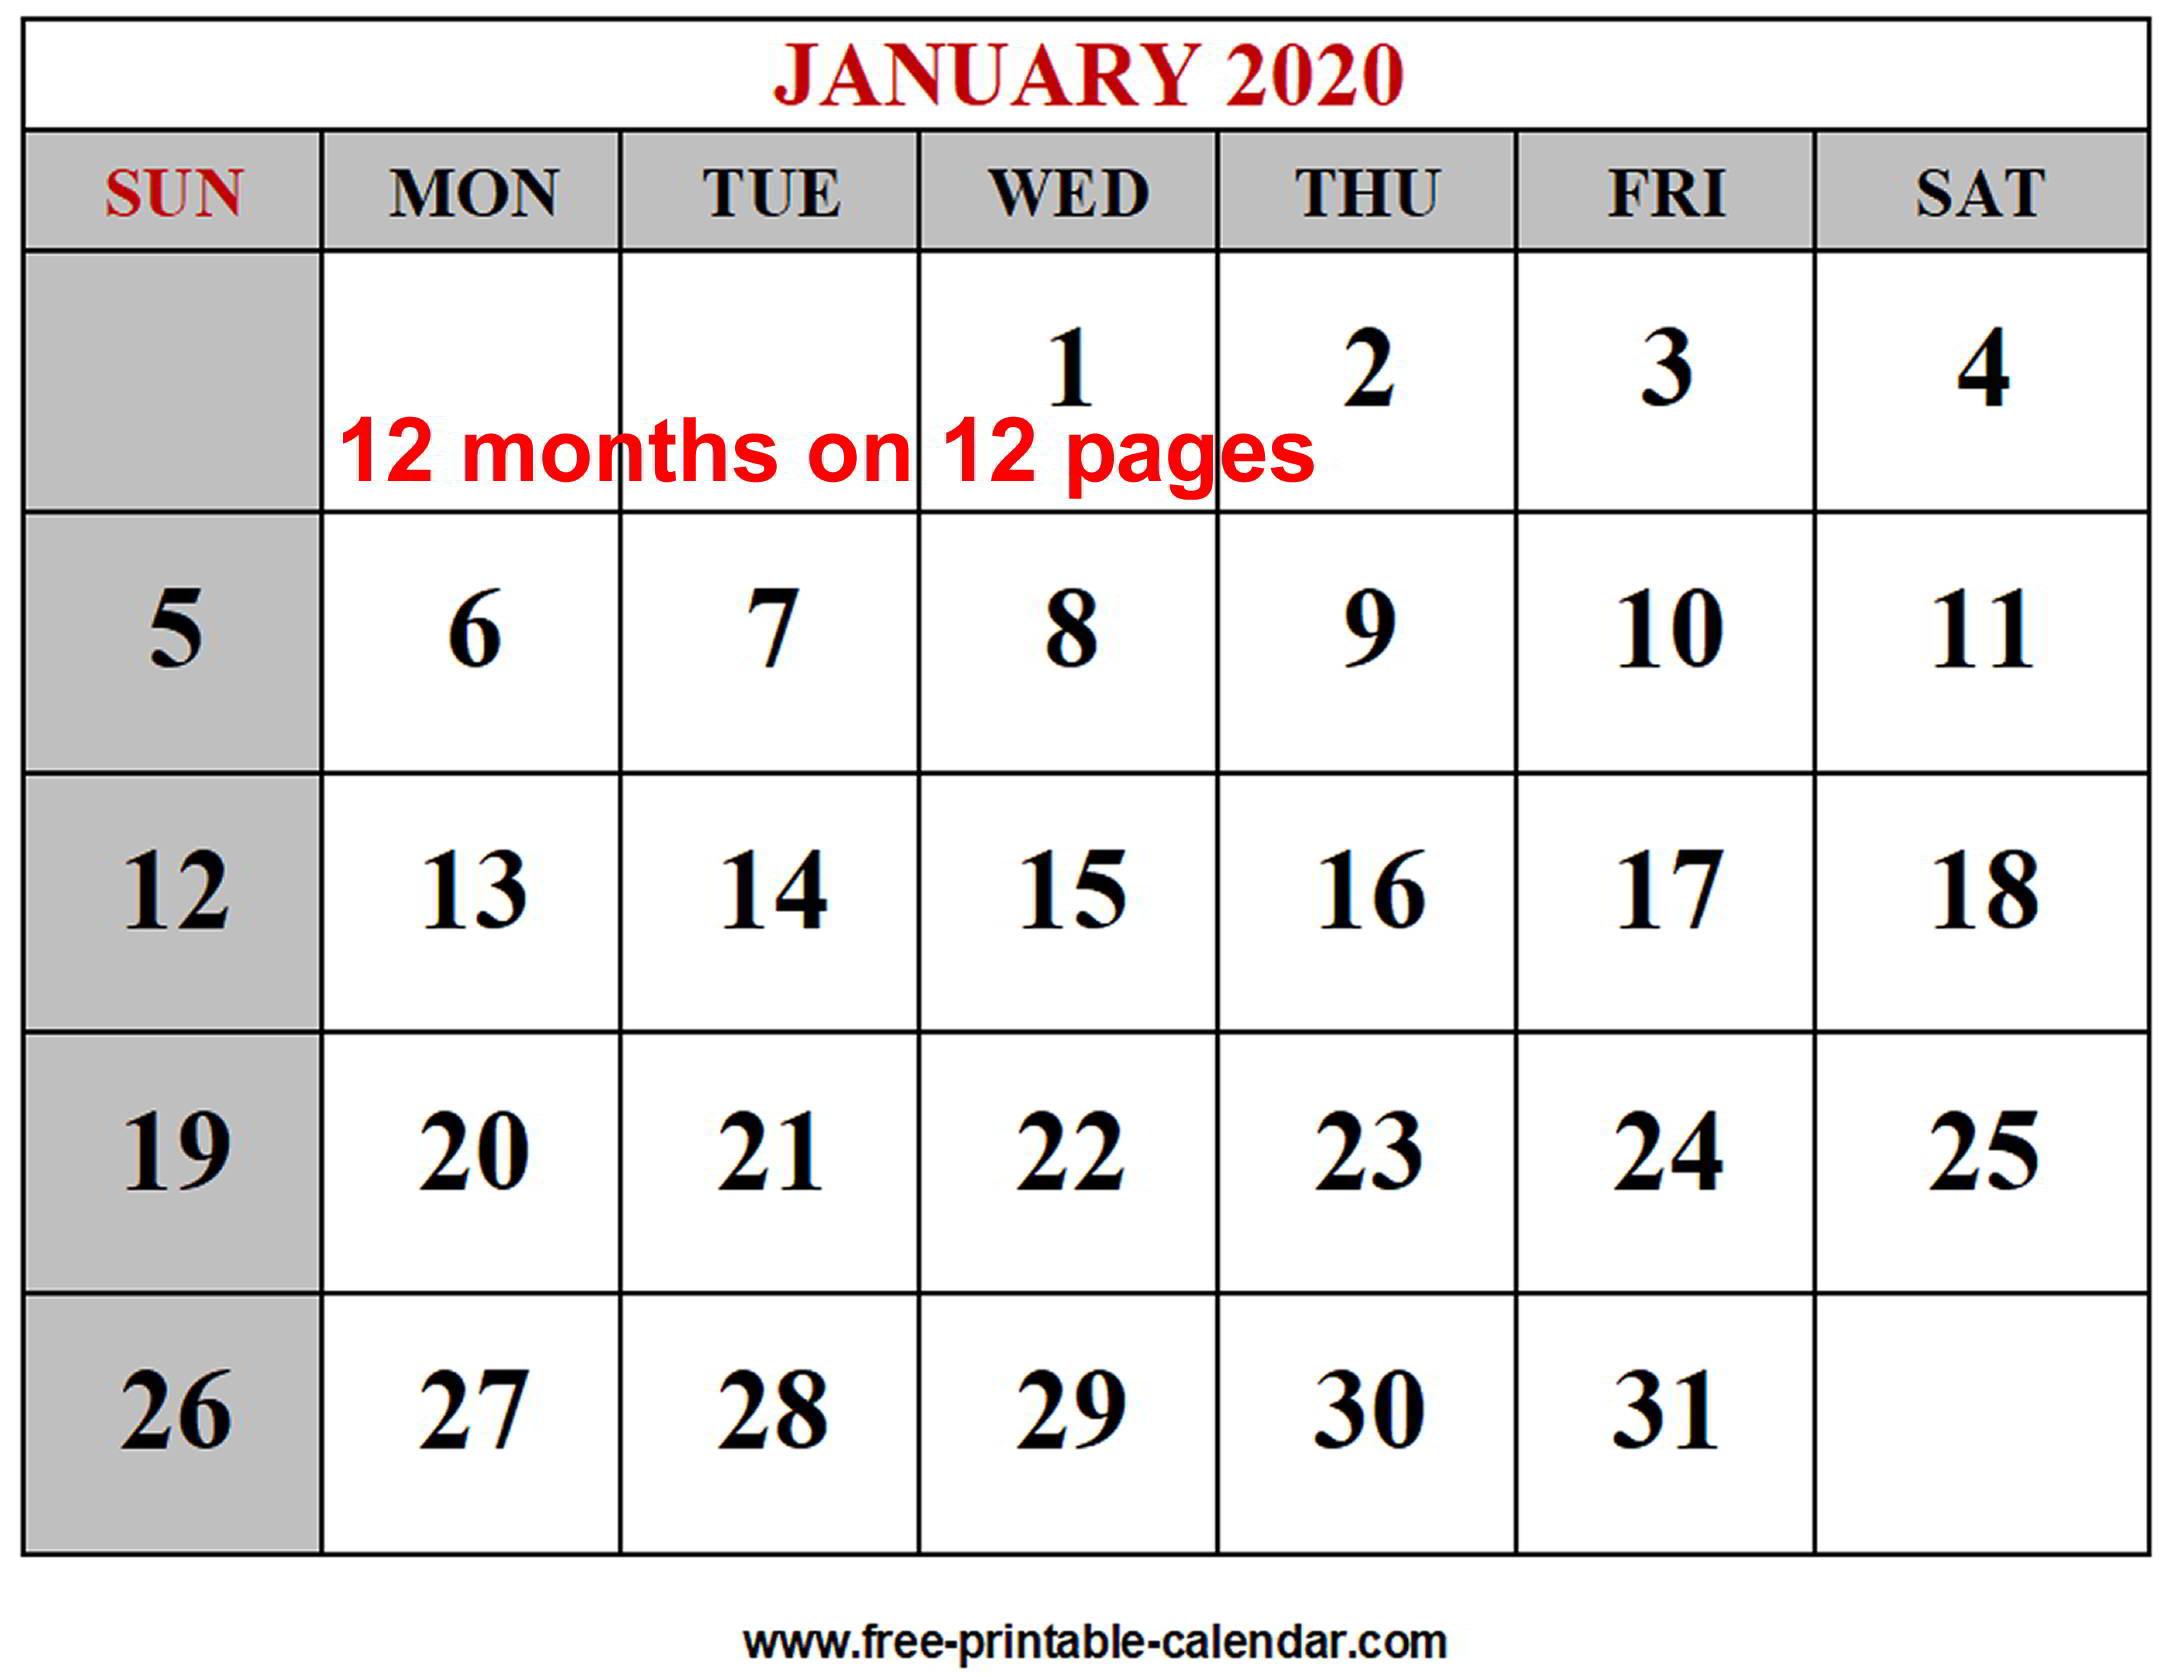 Free Printable Monthly Calendar Templates 2020 - Wpa.wpart.co for 2020 Printable Monthly Calendar Free Vertex